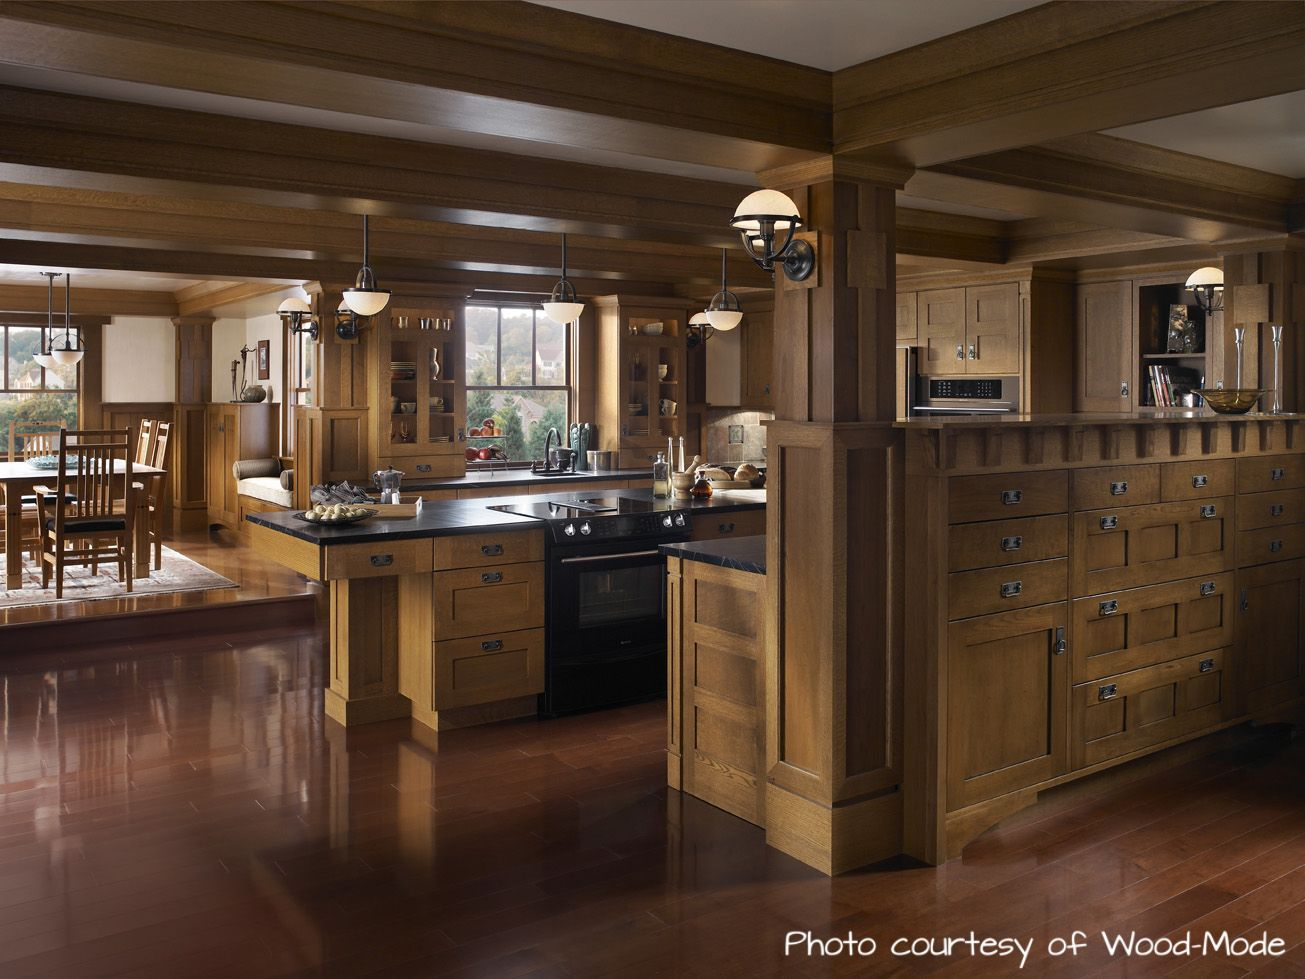 Dissecting The Design An Arts Crafts Kitchen The Cabinet Schedule Craftsman Kitchen Mission Style Kitchens Kitchen Cabinet Styles